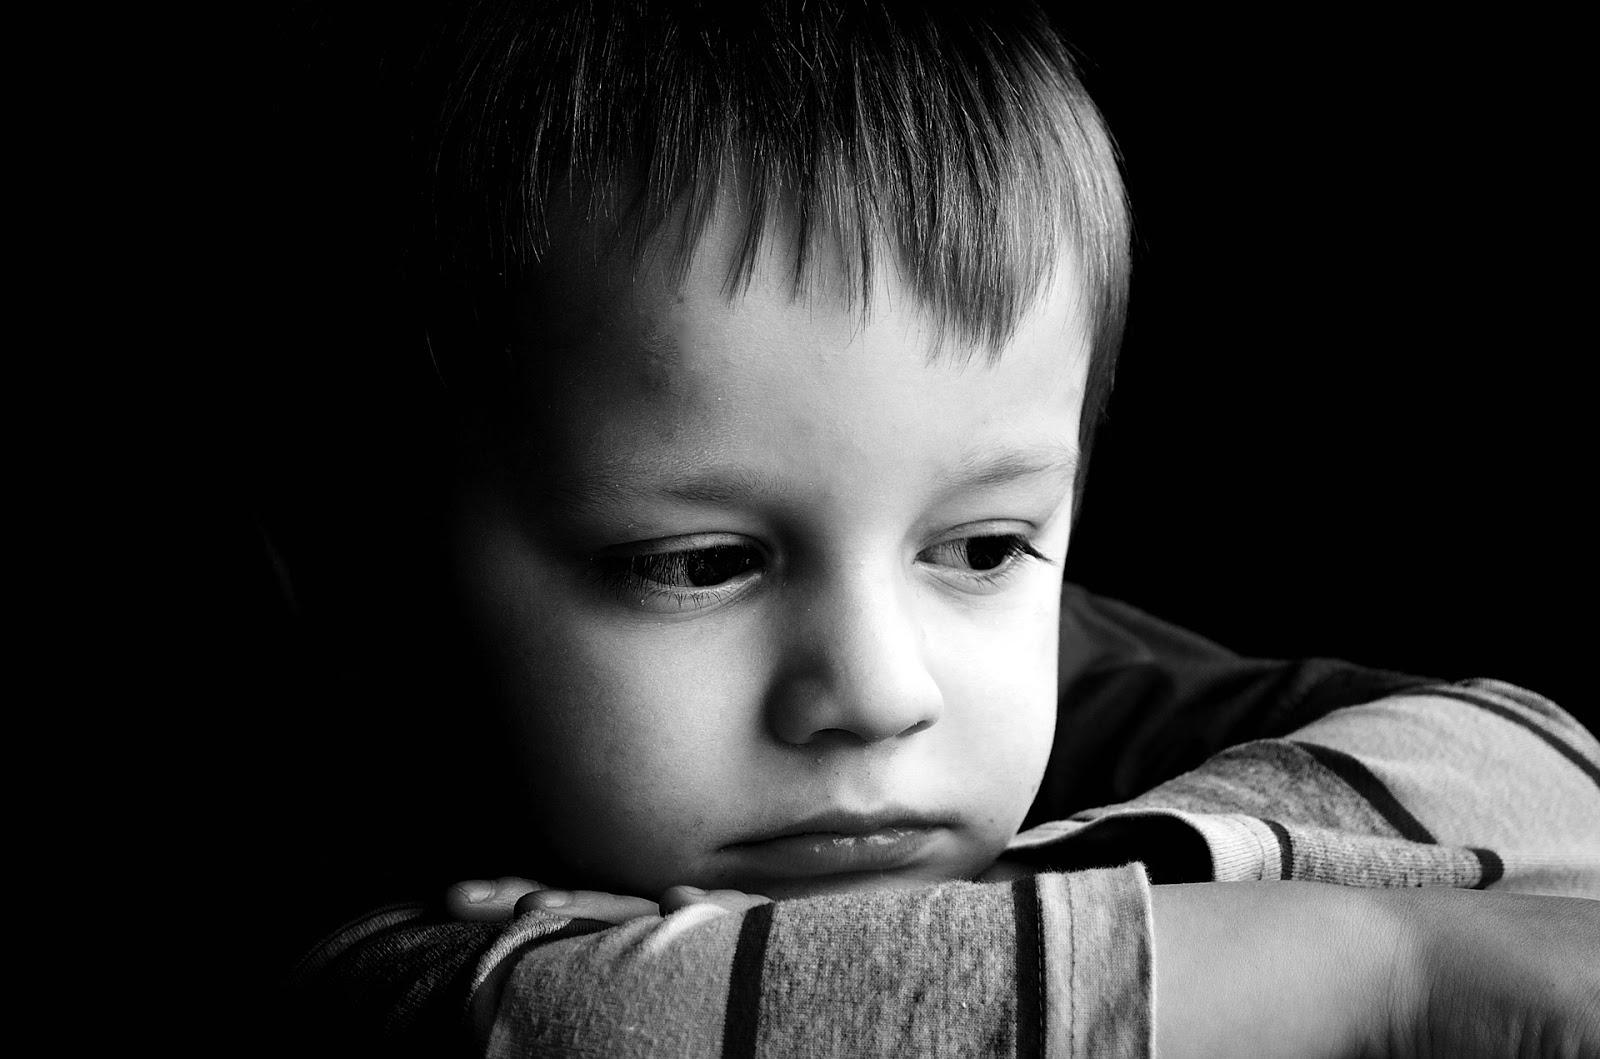 niño, bullying, agresión, Colima, terapia intensiva